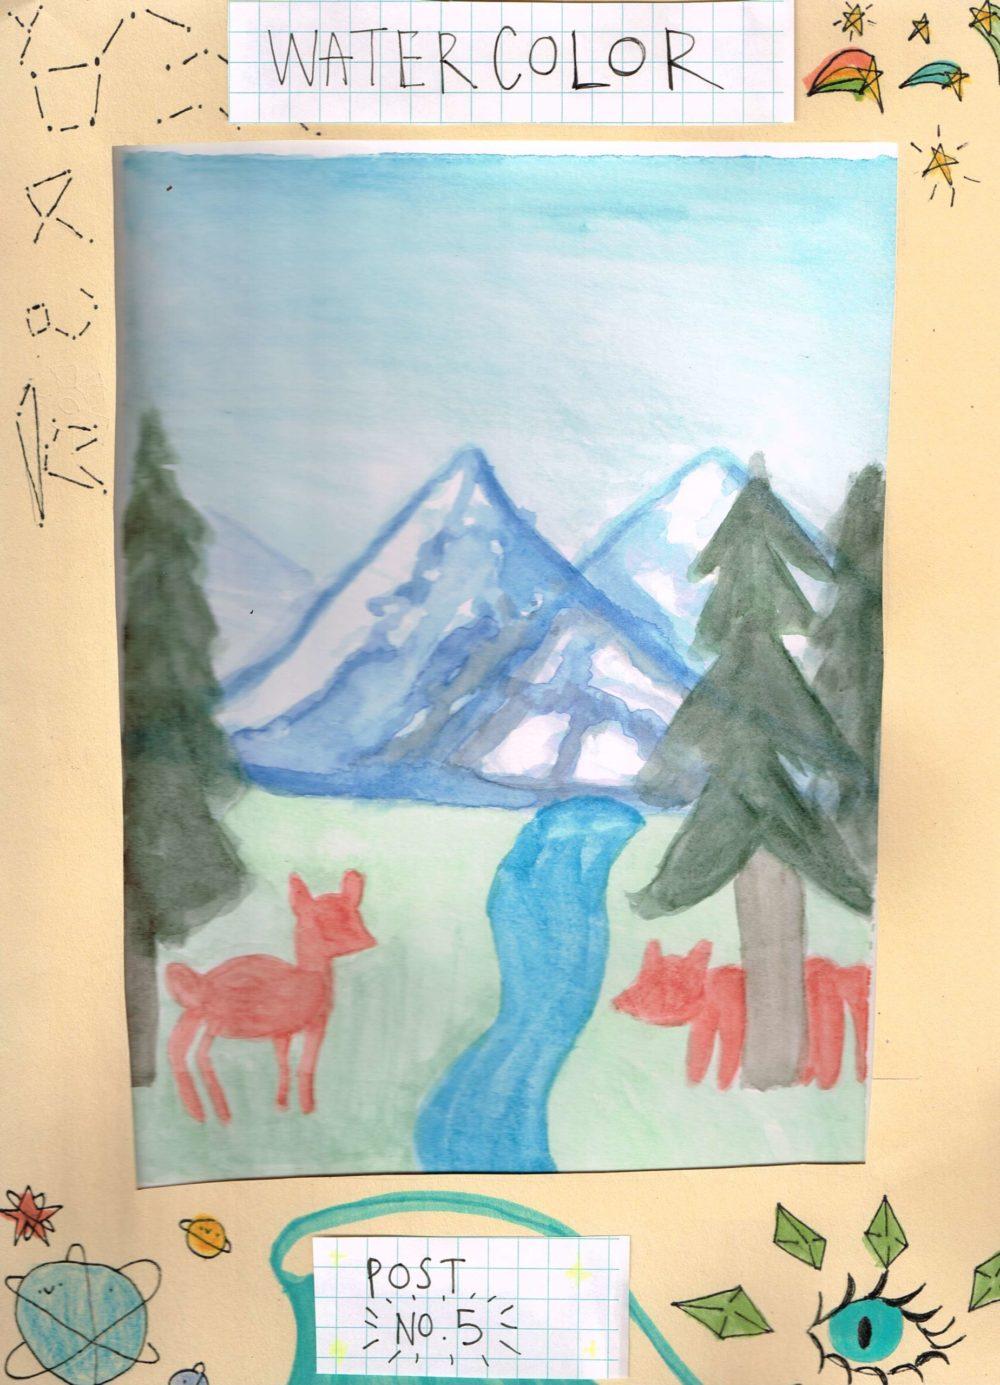 Apex After Apex: Watercolor